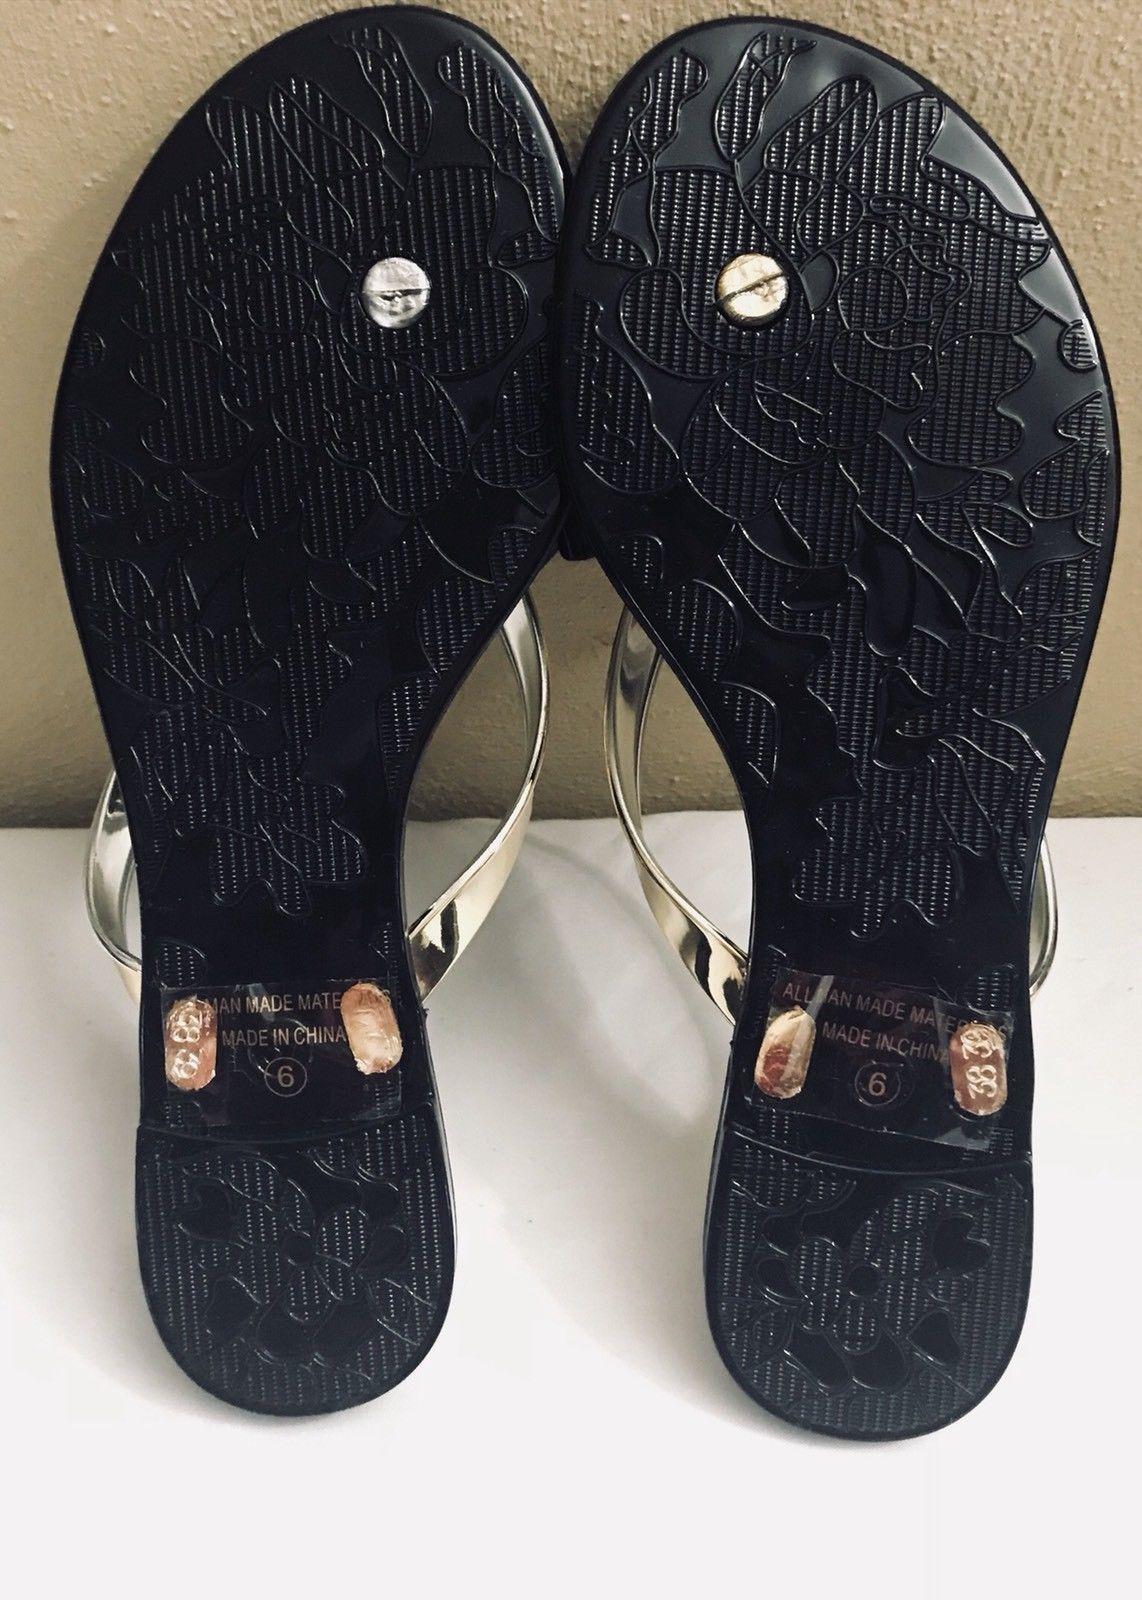 18a1a0f3736b Wild Diva Lounge Black Gold Rhinestone Thong Jelly Sandals Women s Size 6